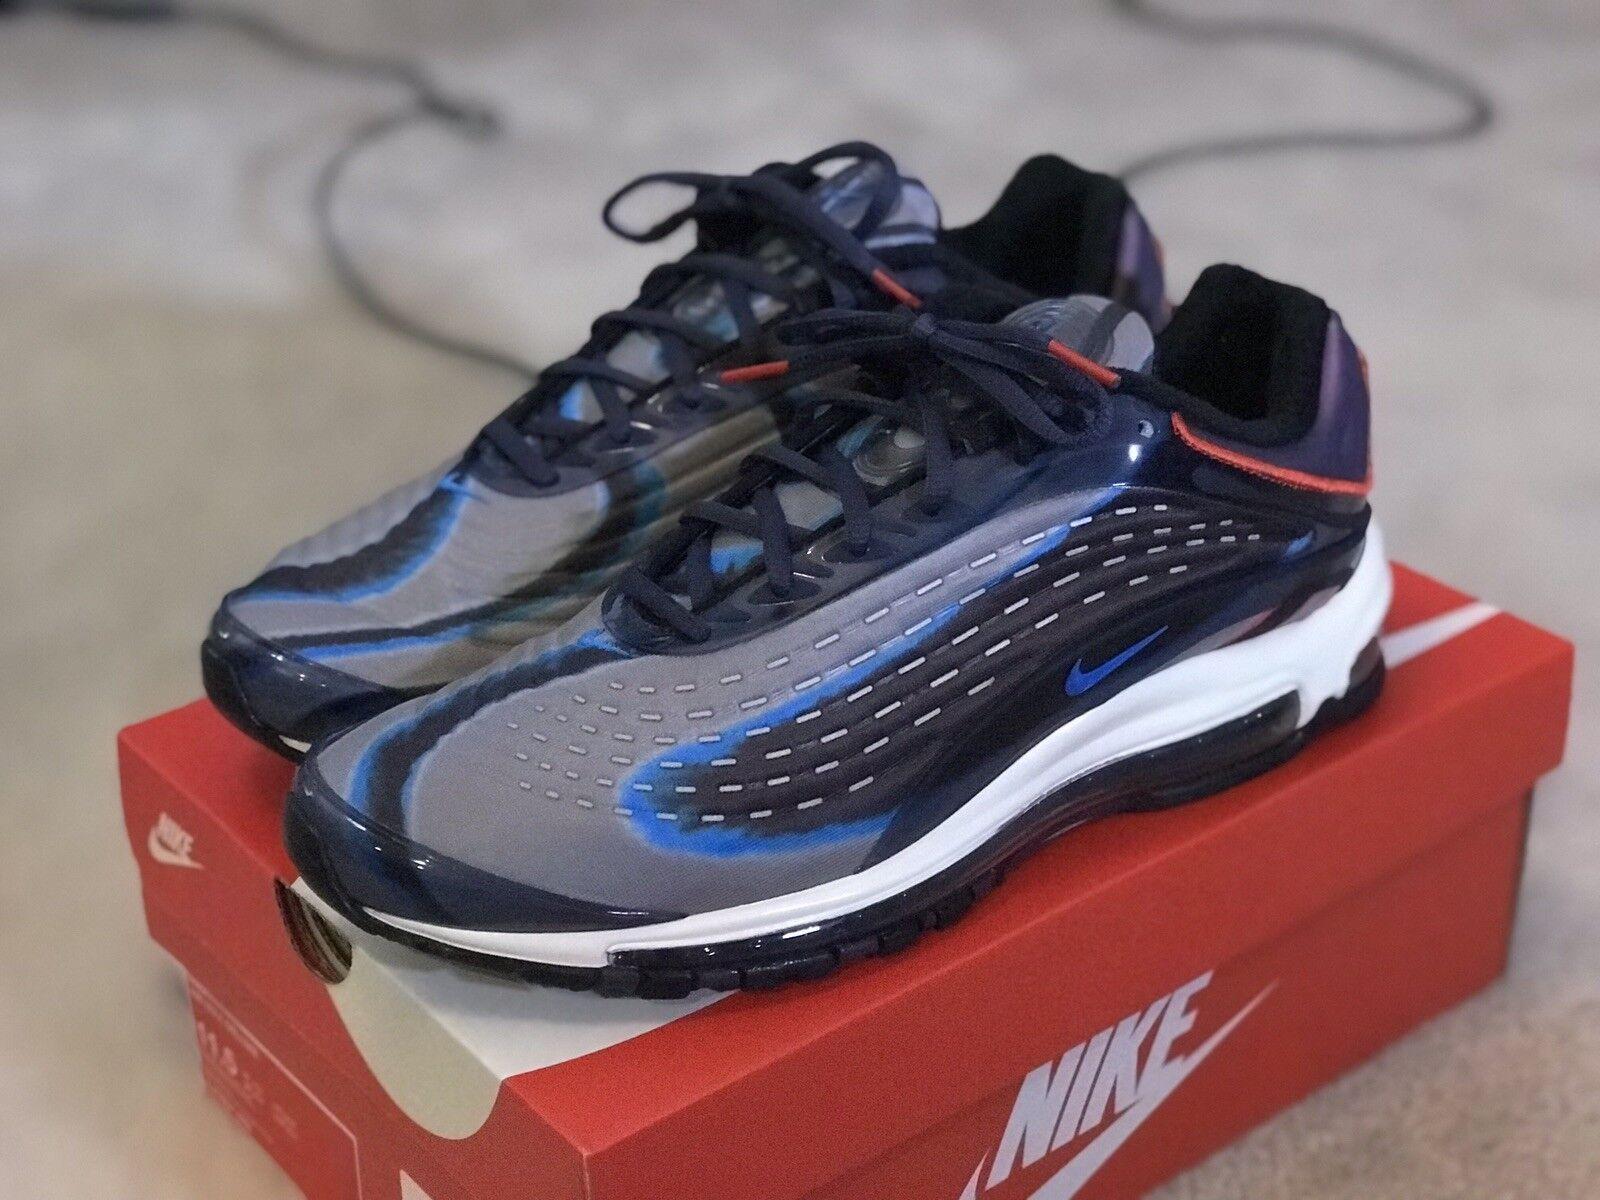 premium selection 2386a 4e72d Nike Air Deluxe Thunder Blau Men US 11.5 SNKRS Hypebeast FASHION STREETWEAR  Max nrztvk3893-Sneaker